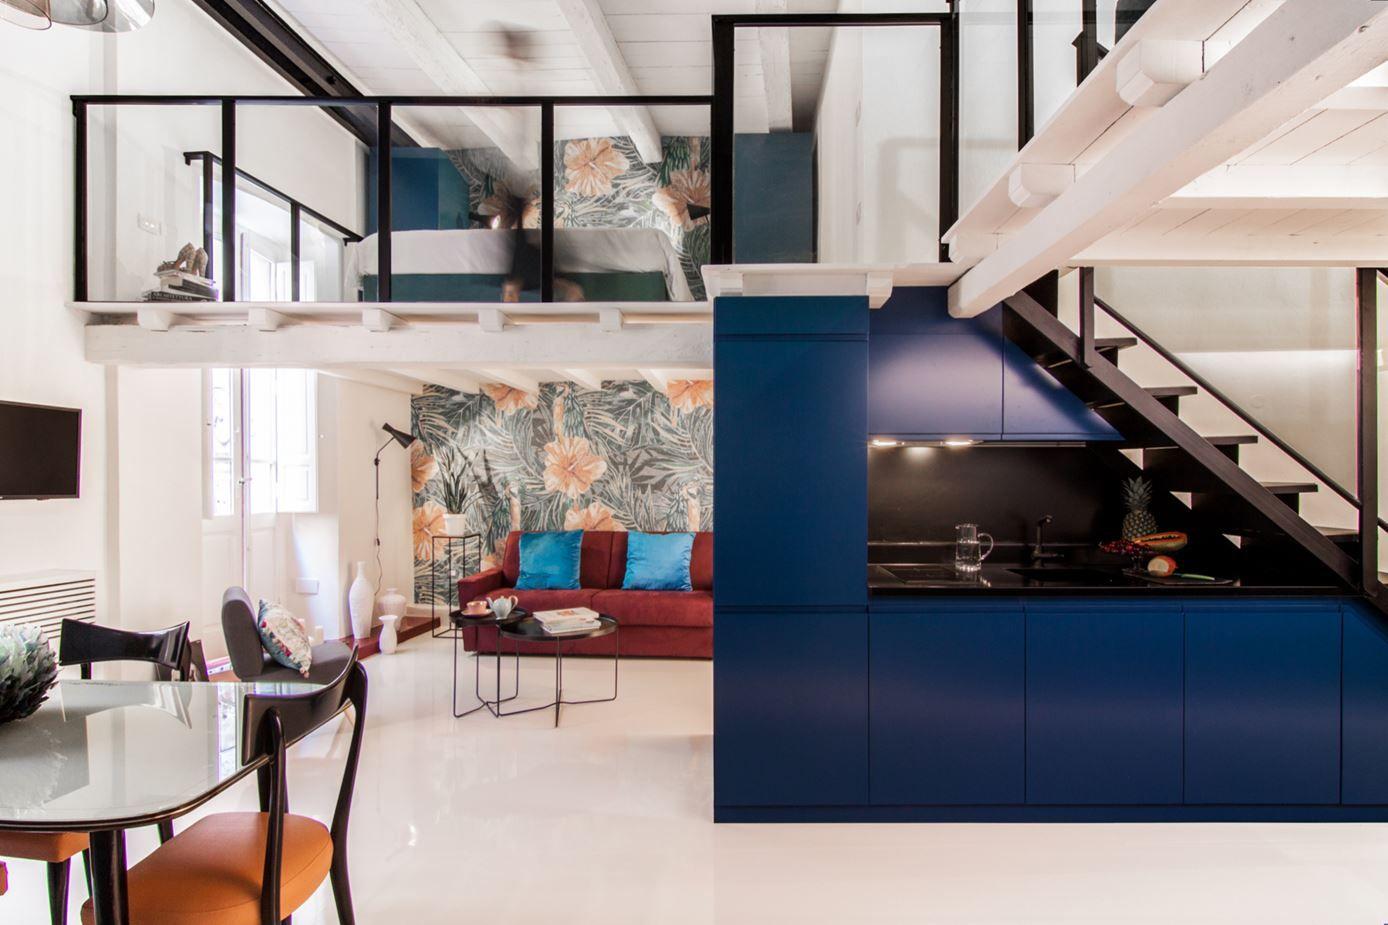 Cool Interior Designs Illustrate The Versatility Of A Mezzanine Floor